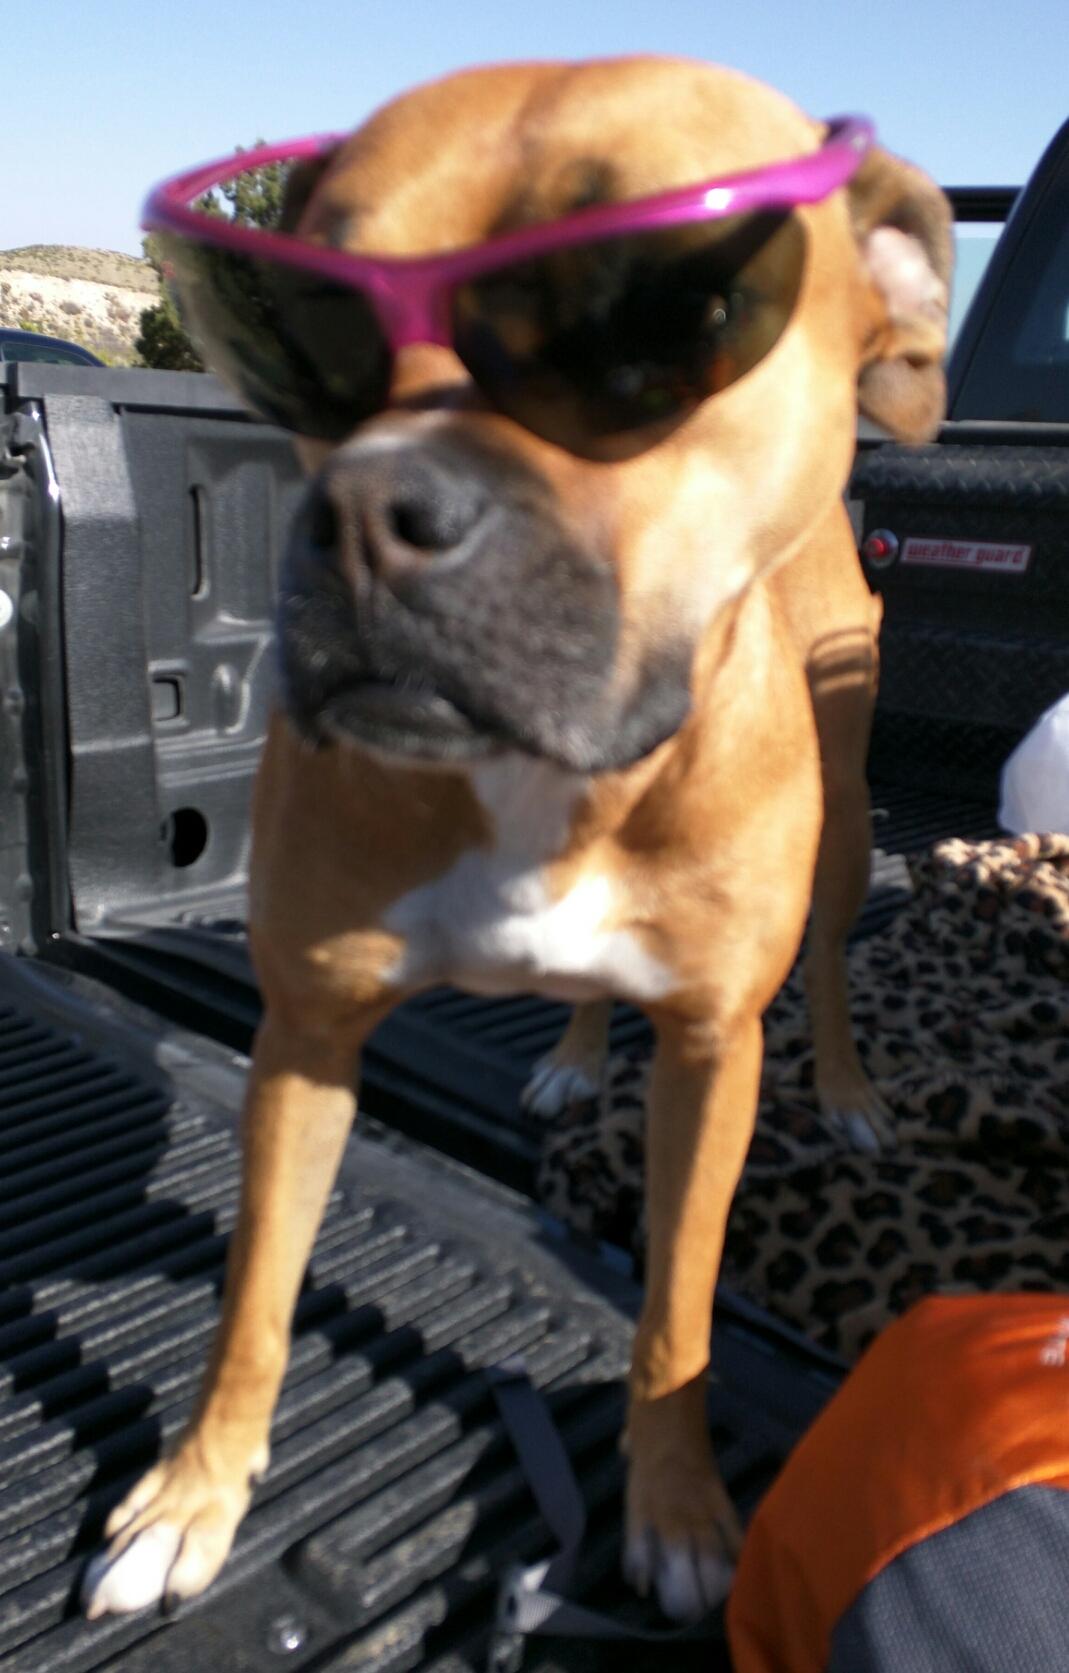 dog wearing shades